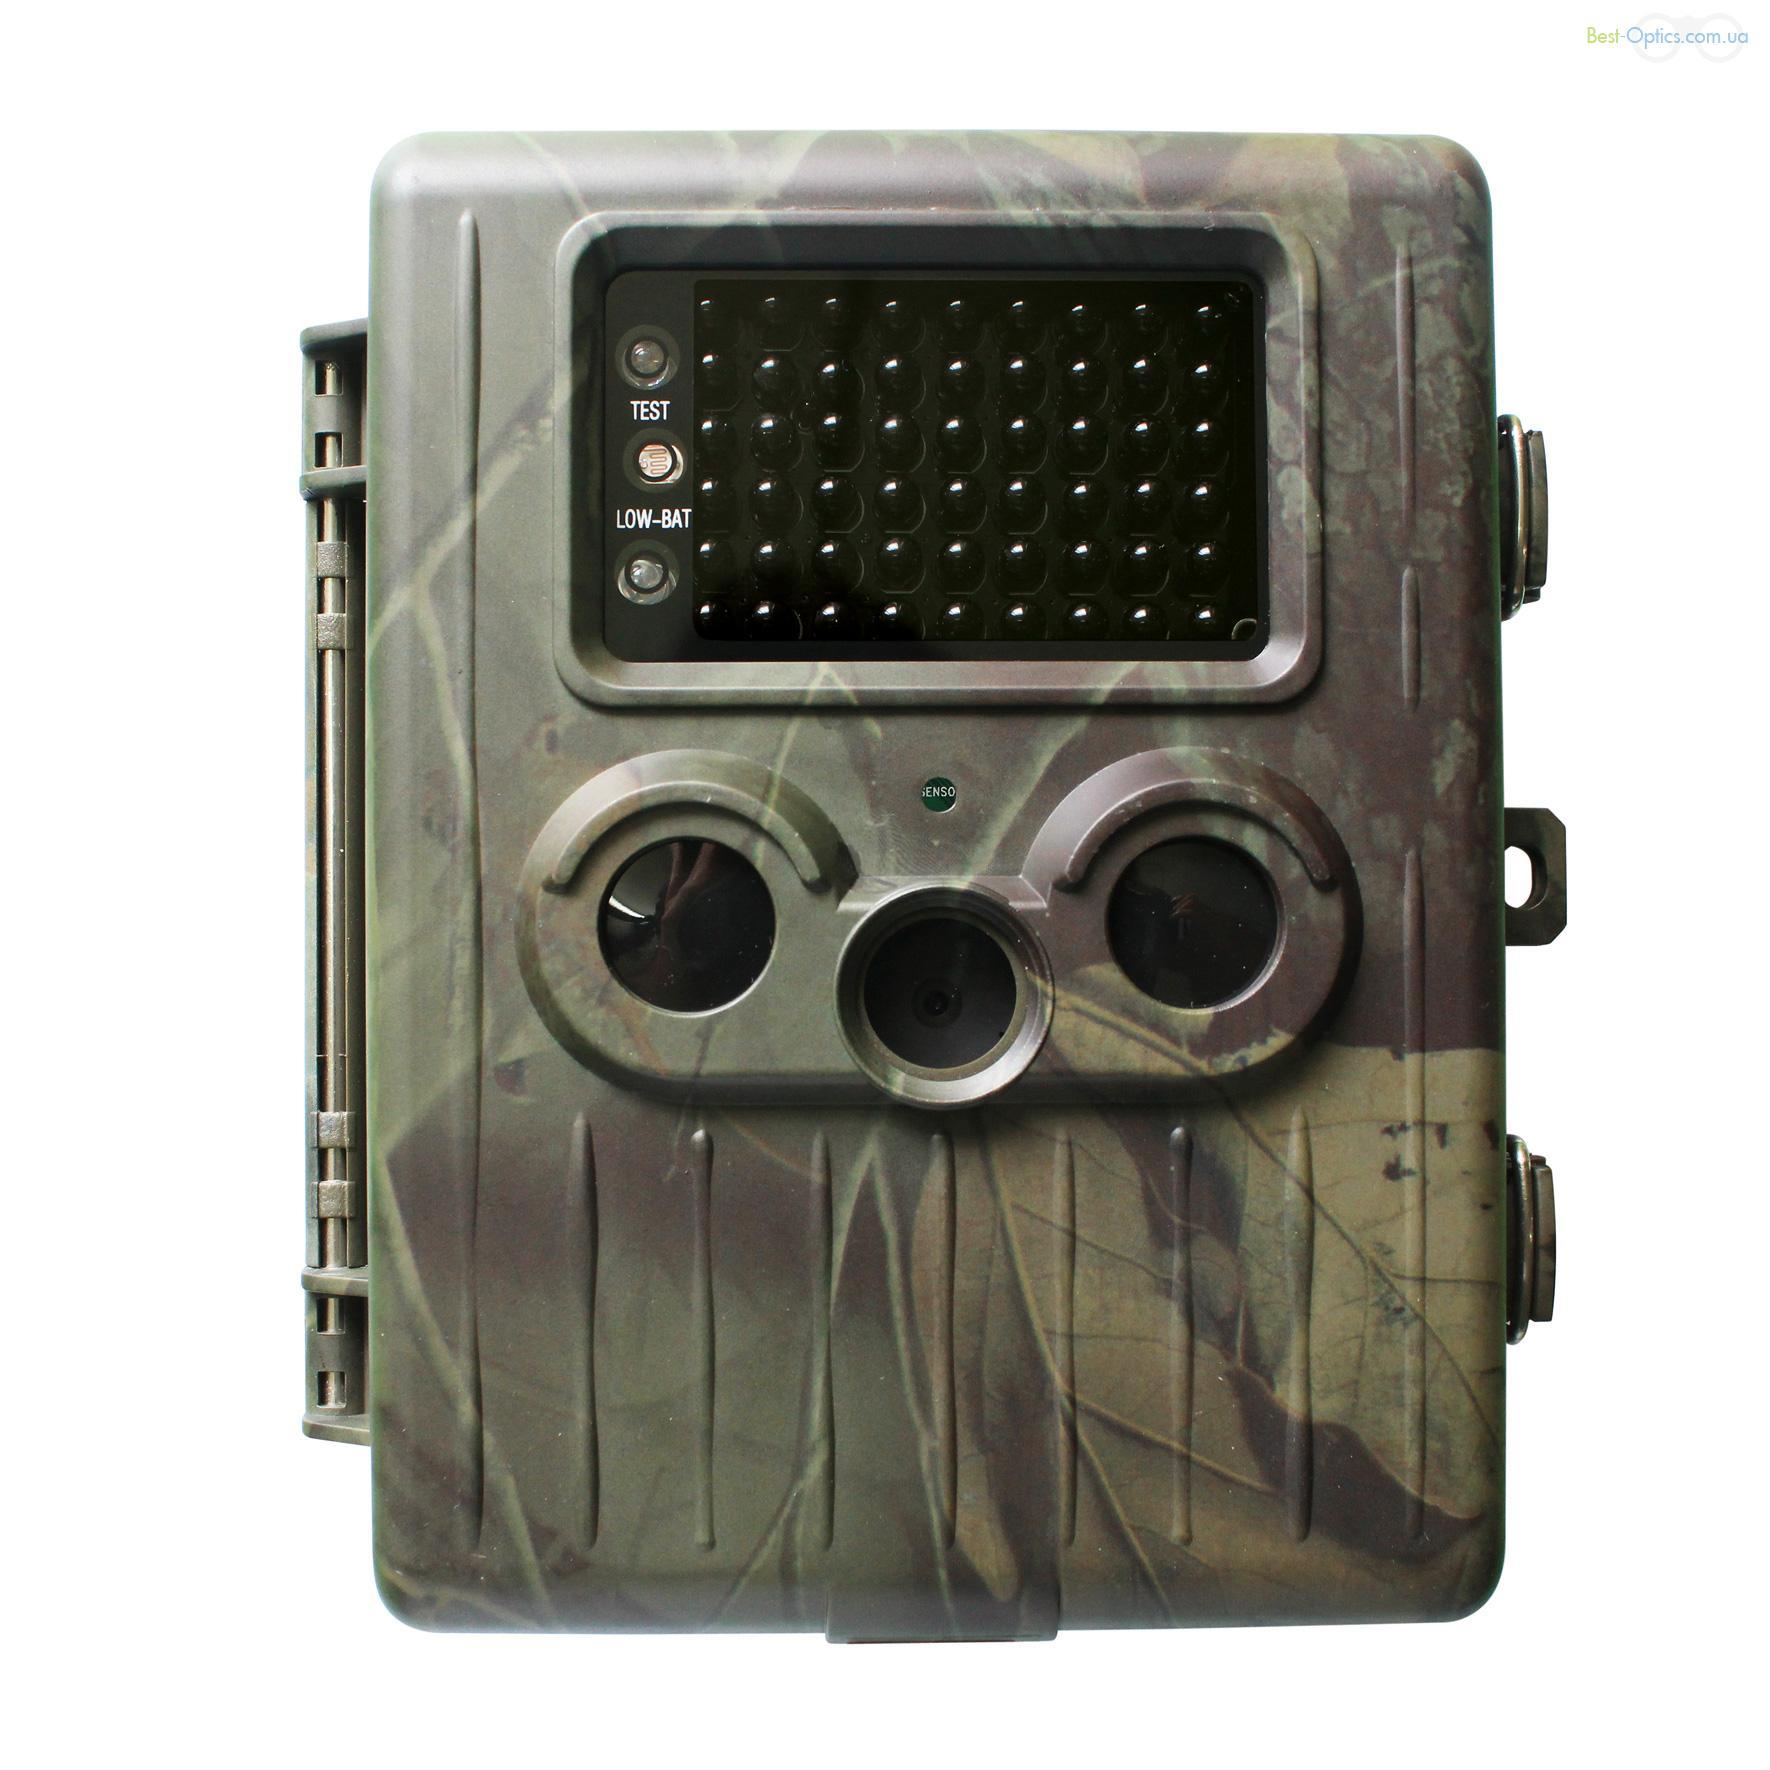 Фотоловушка Braun Scouting Cam Black 400 Phone